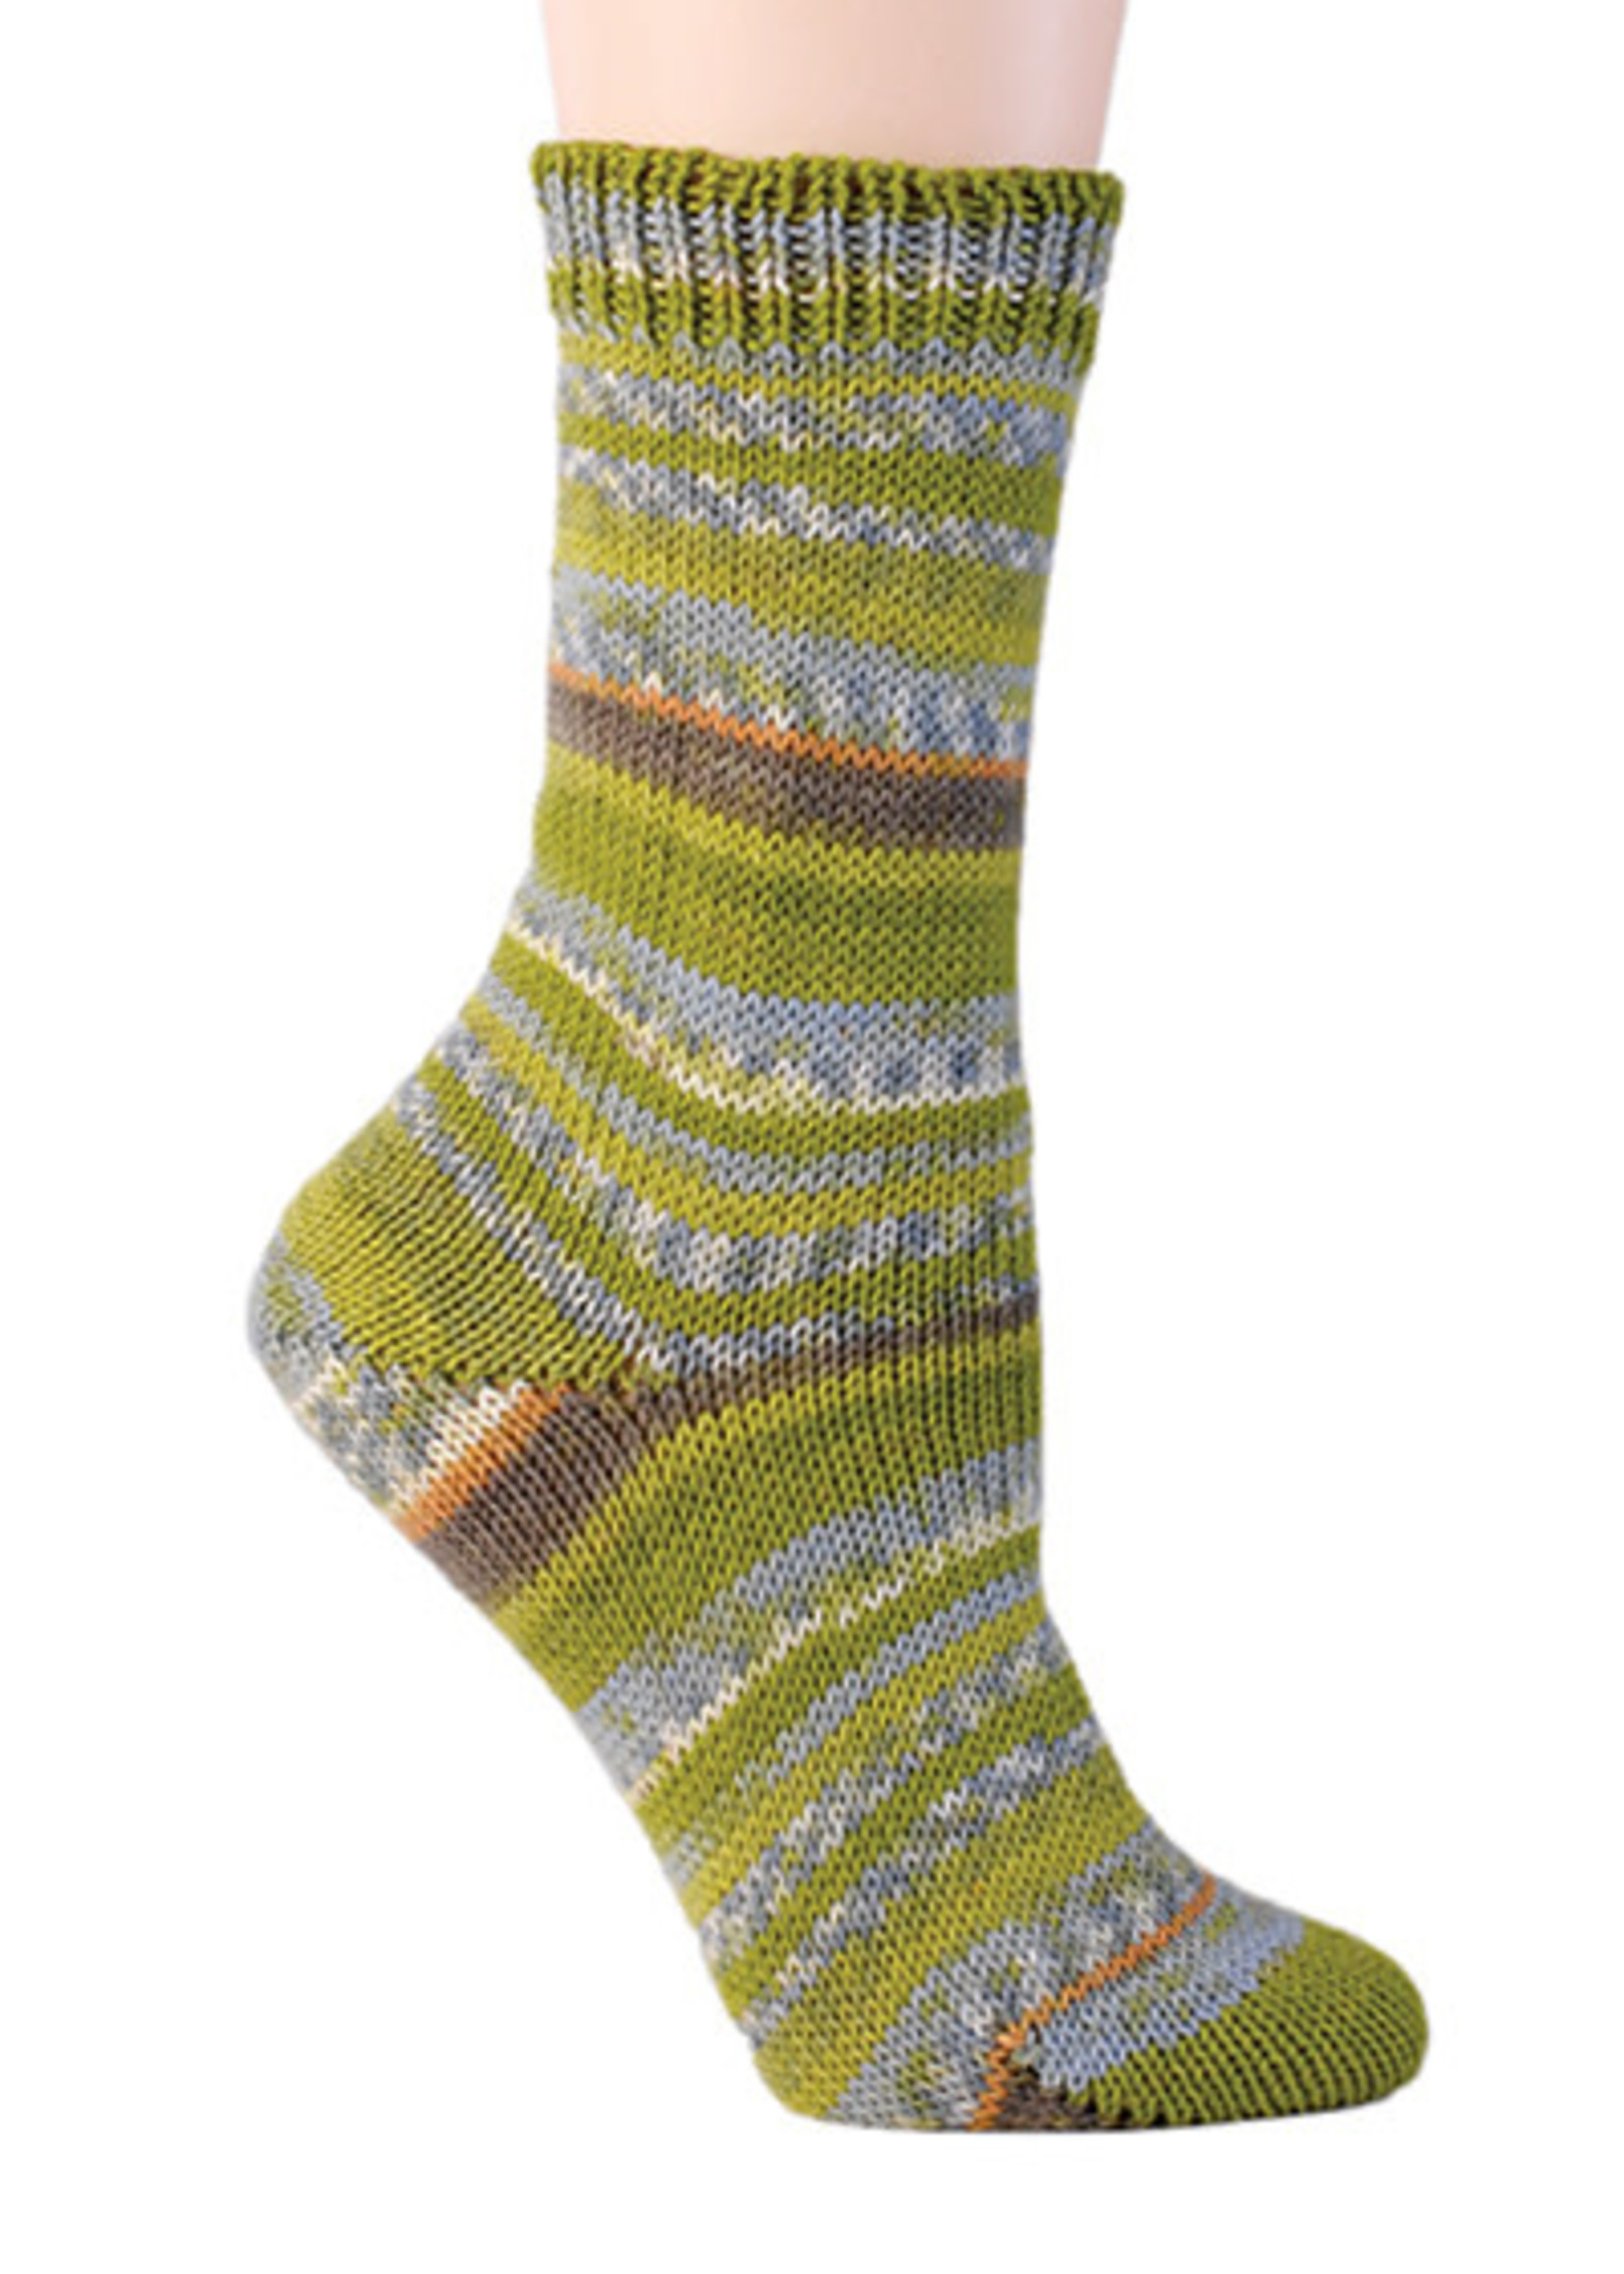 Berroco Berroco Comfort Sock Yarn #1815 Fruit Cocktail